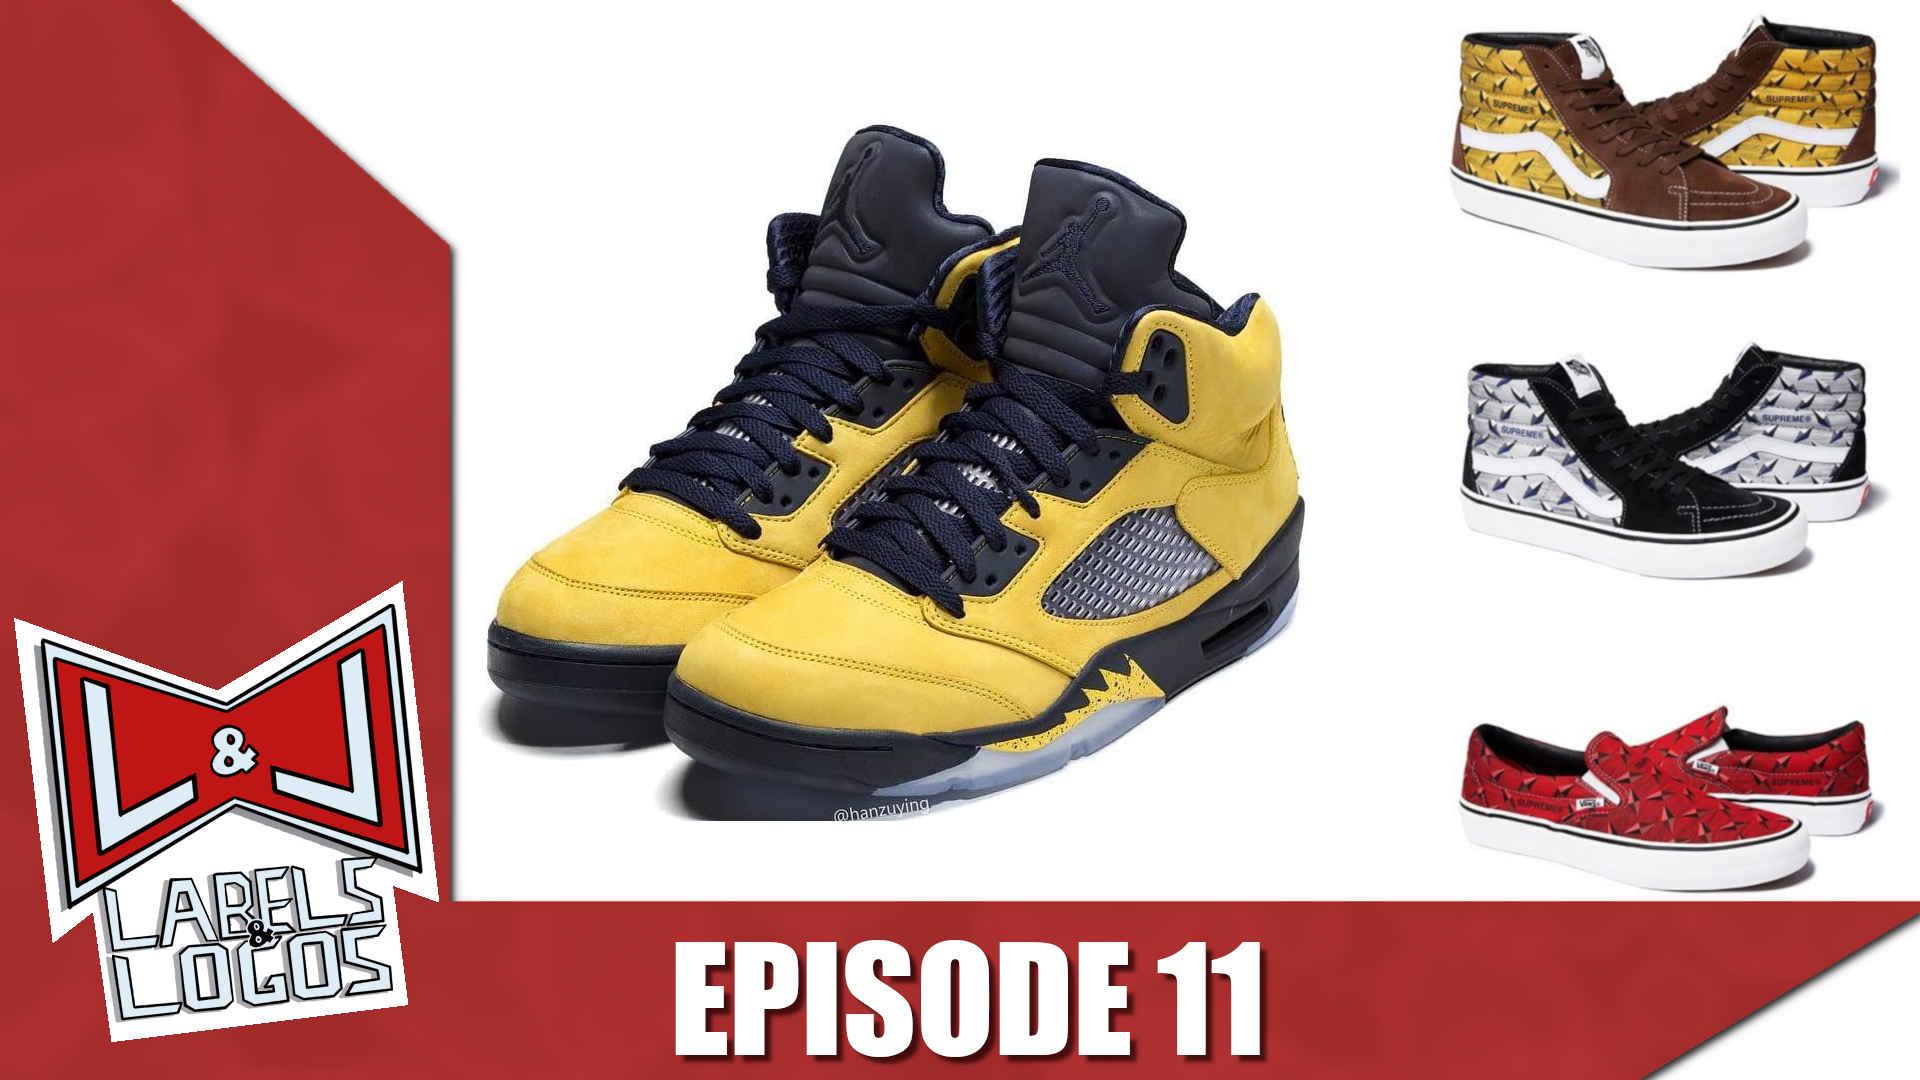 Labels & Logos - Episode 11